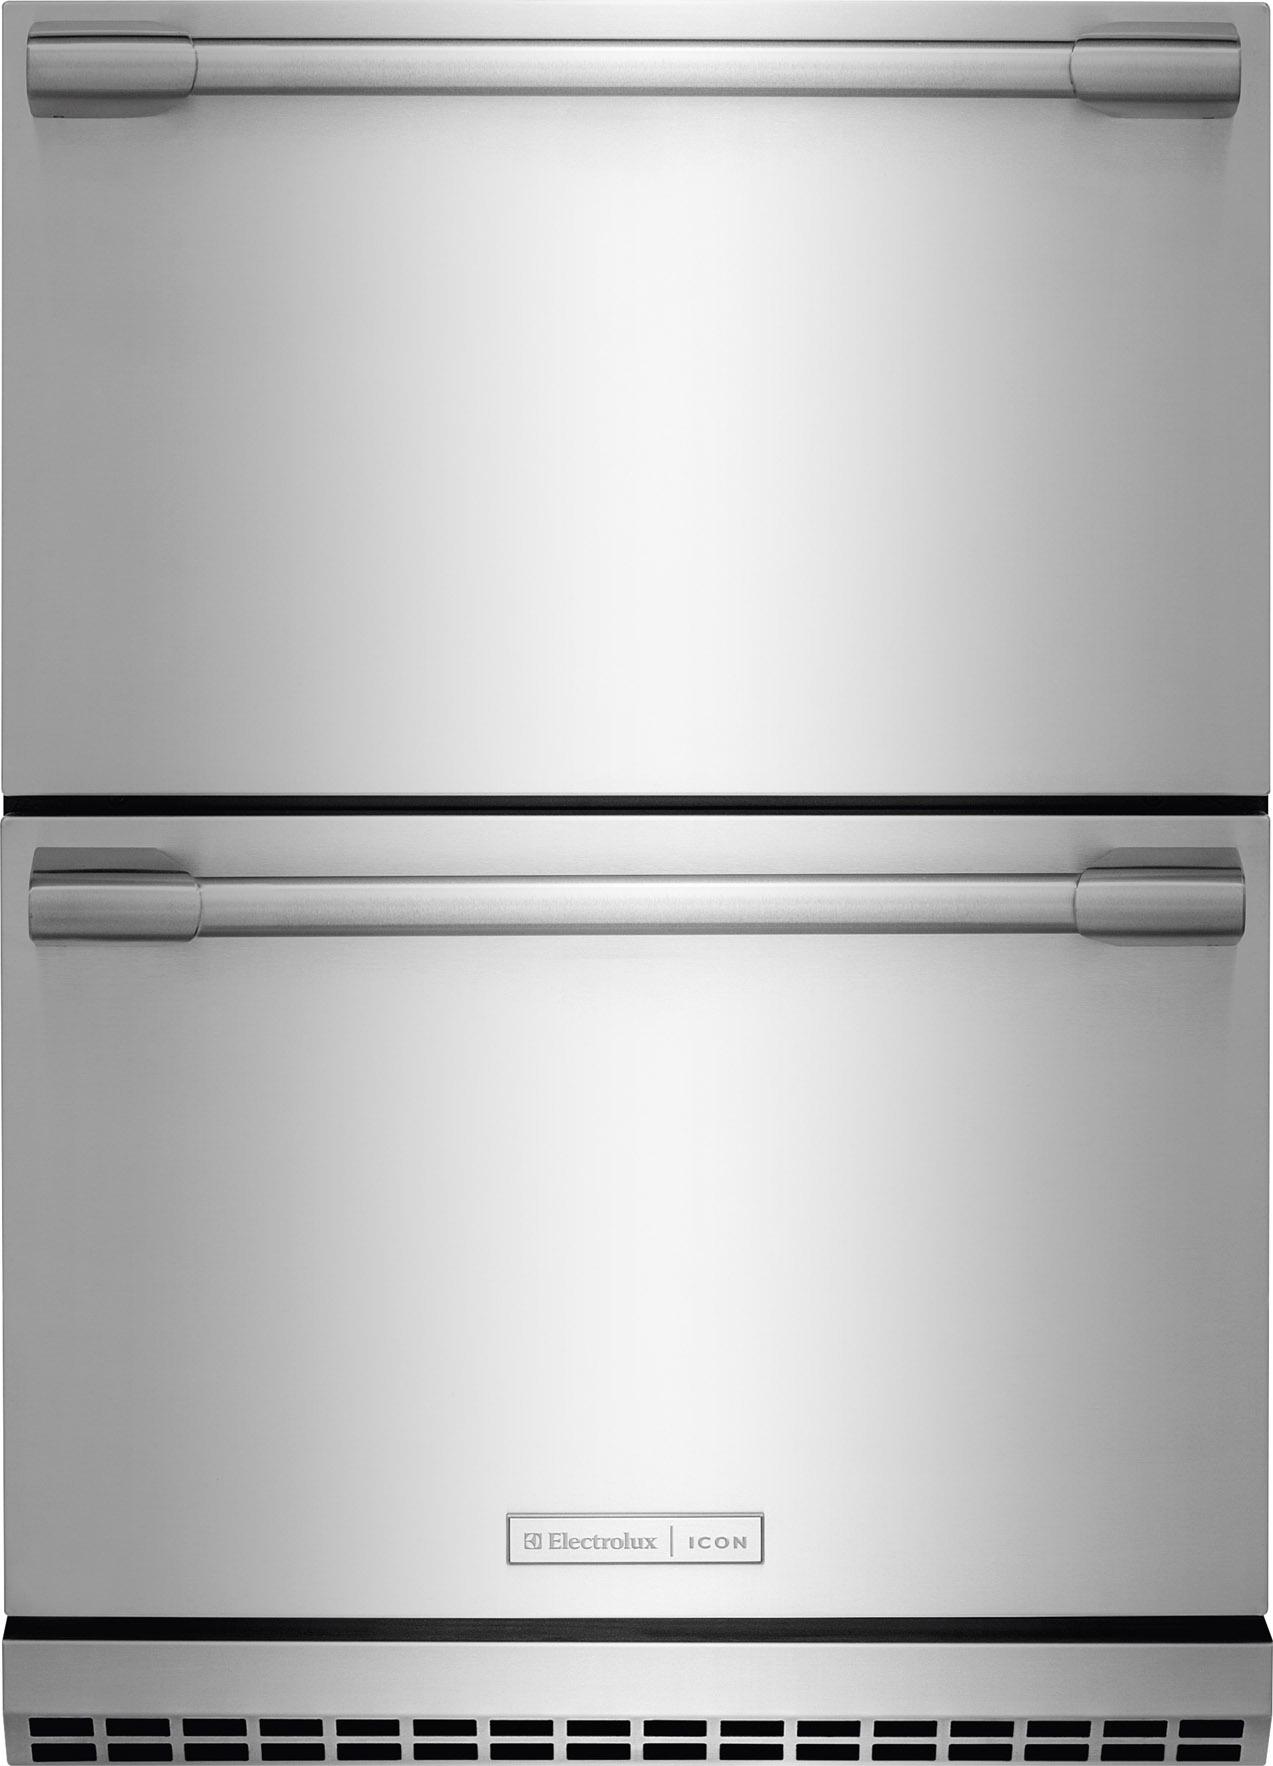 detail sanitize dishdrawer tall dishdraweracaac single and racking water flex refrigerator dishwasher clothes full drawer incl organizer softener of superb extradry